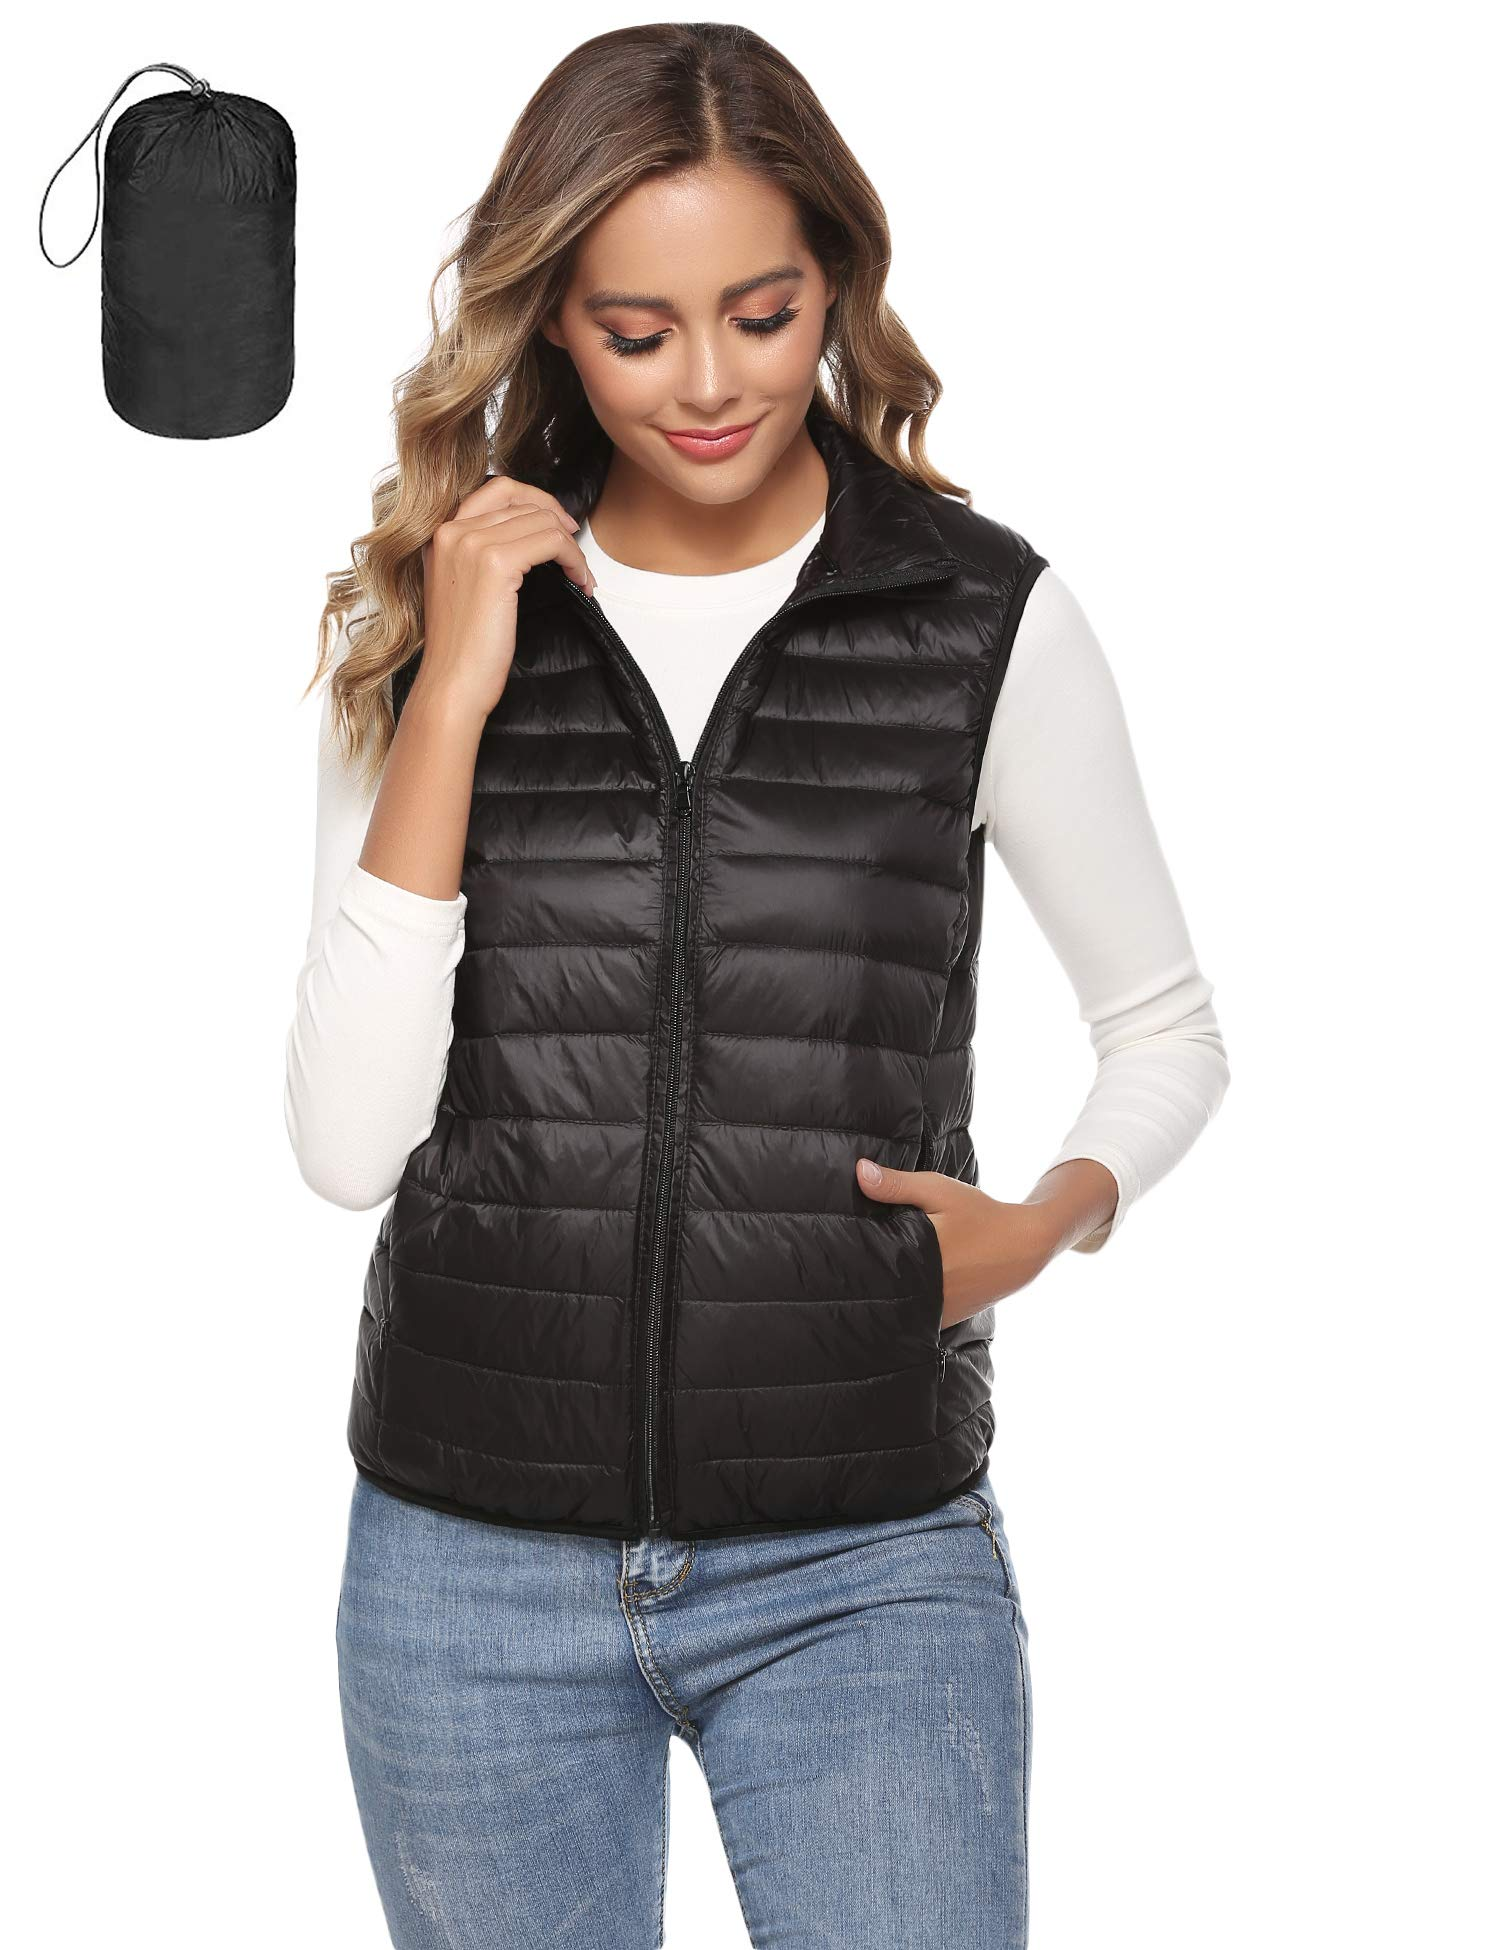 Hawiton Women's Lightweight Down Packable Vests Alternative Outerwear Zipper Vest Jacket